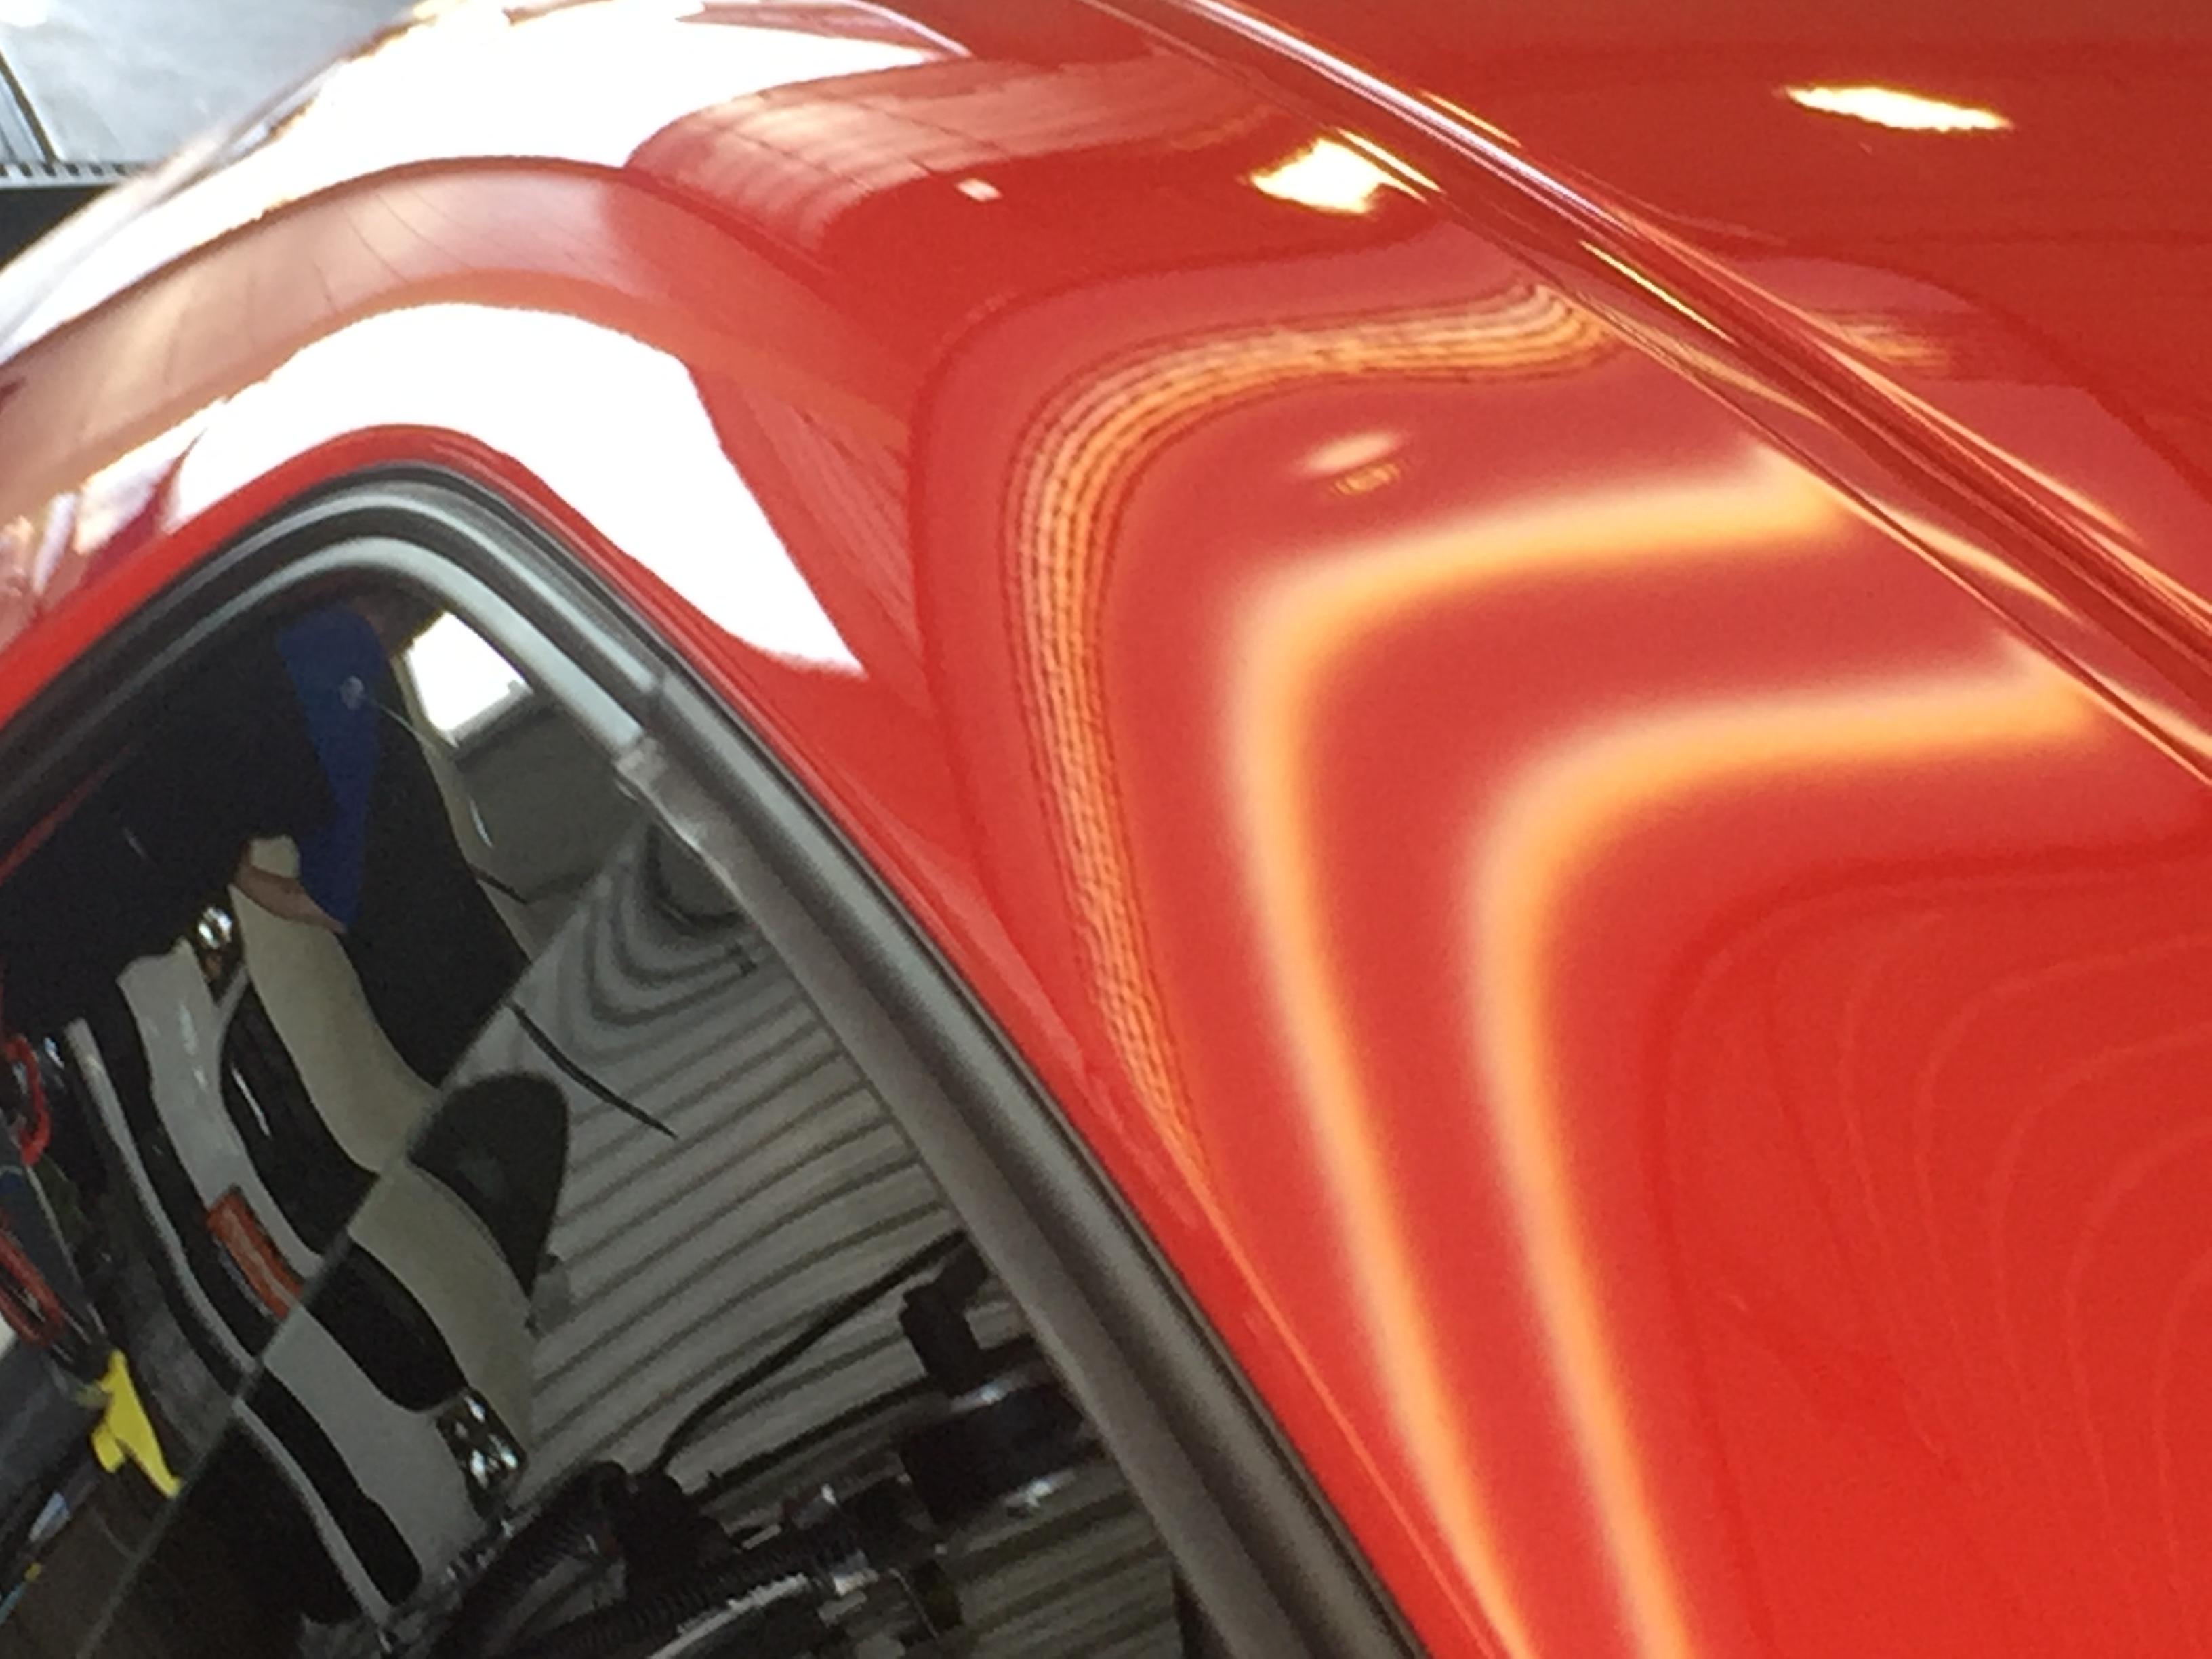 2009 Dodge Challenger SRT8 Dent Repair on Roof Rail, Springfield, IL. http://217dent.com